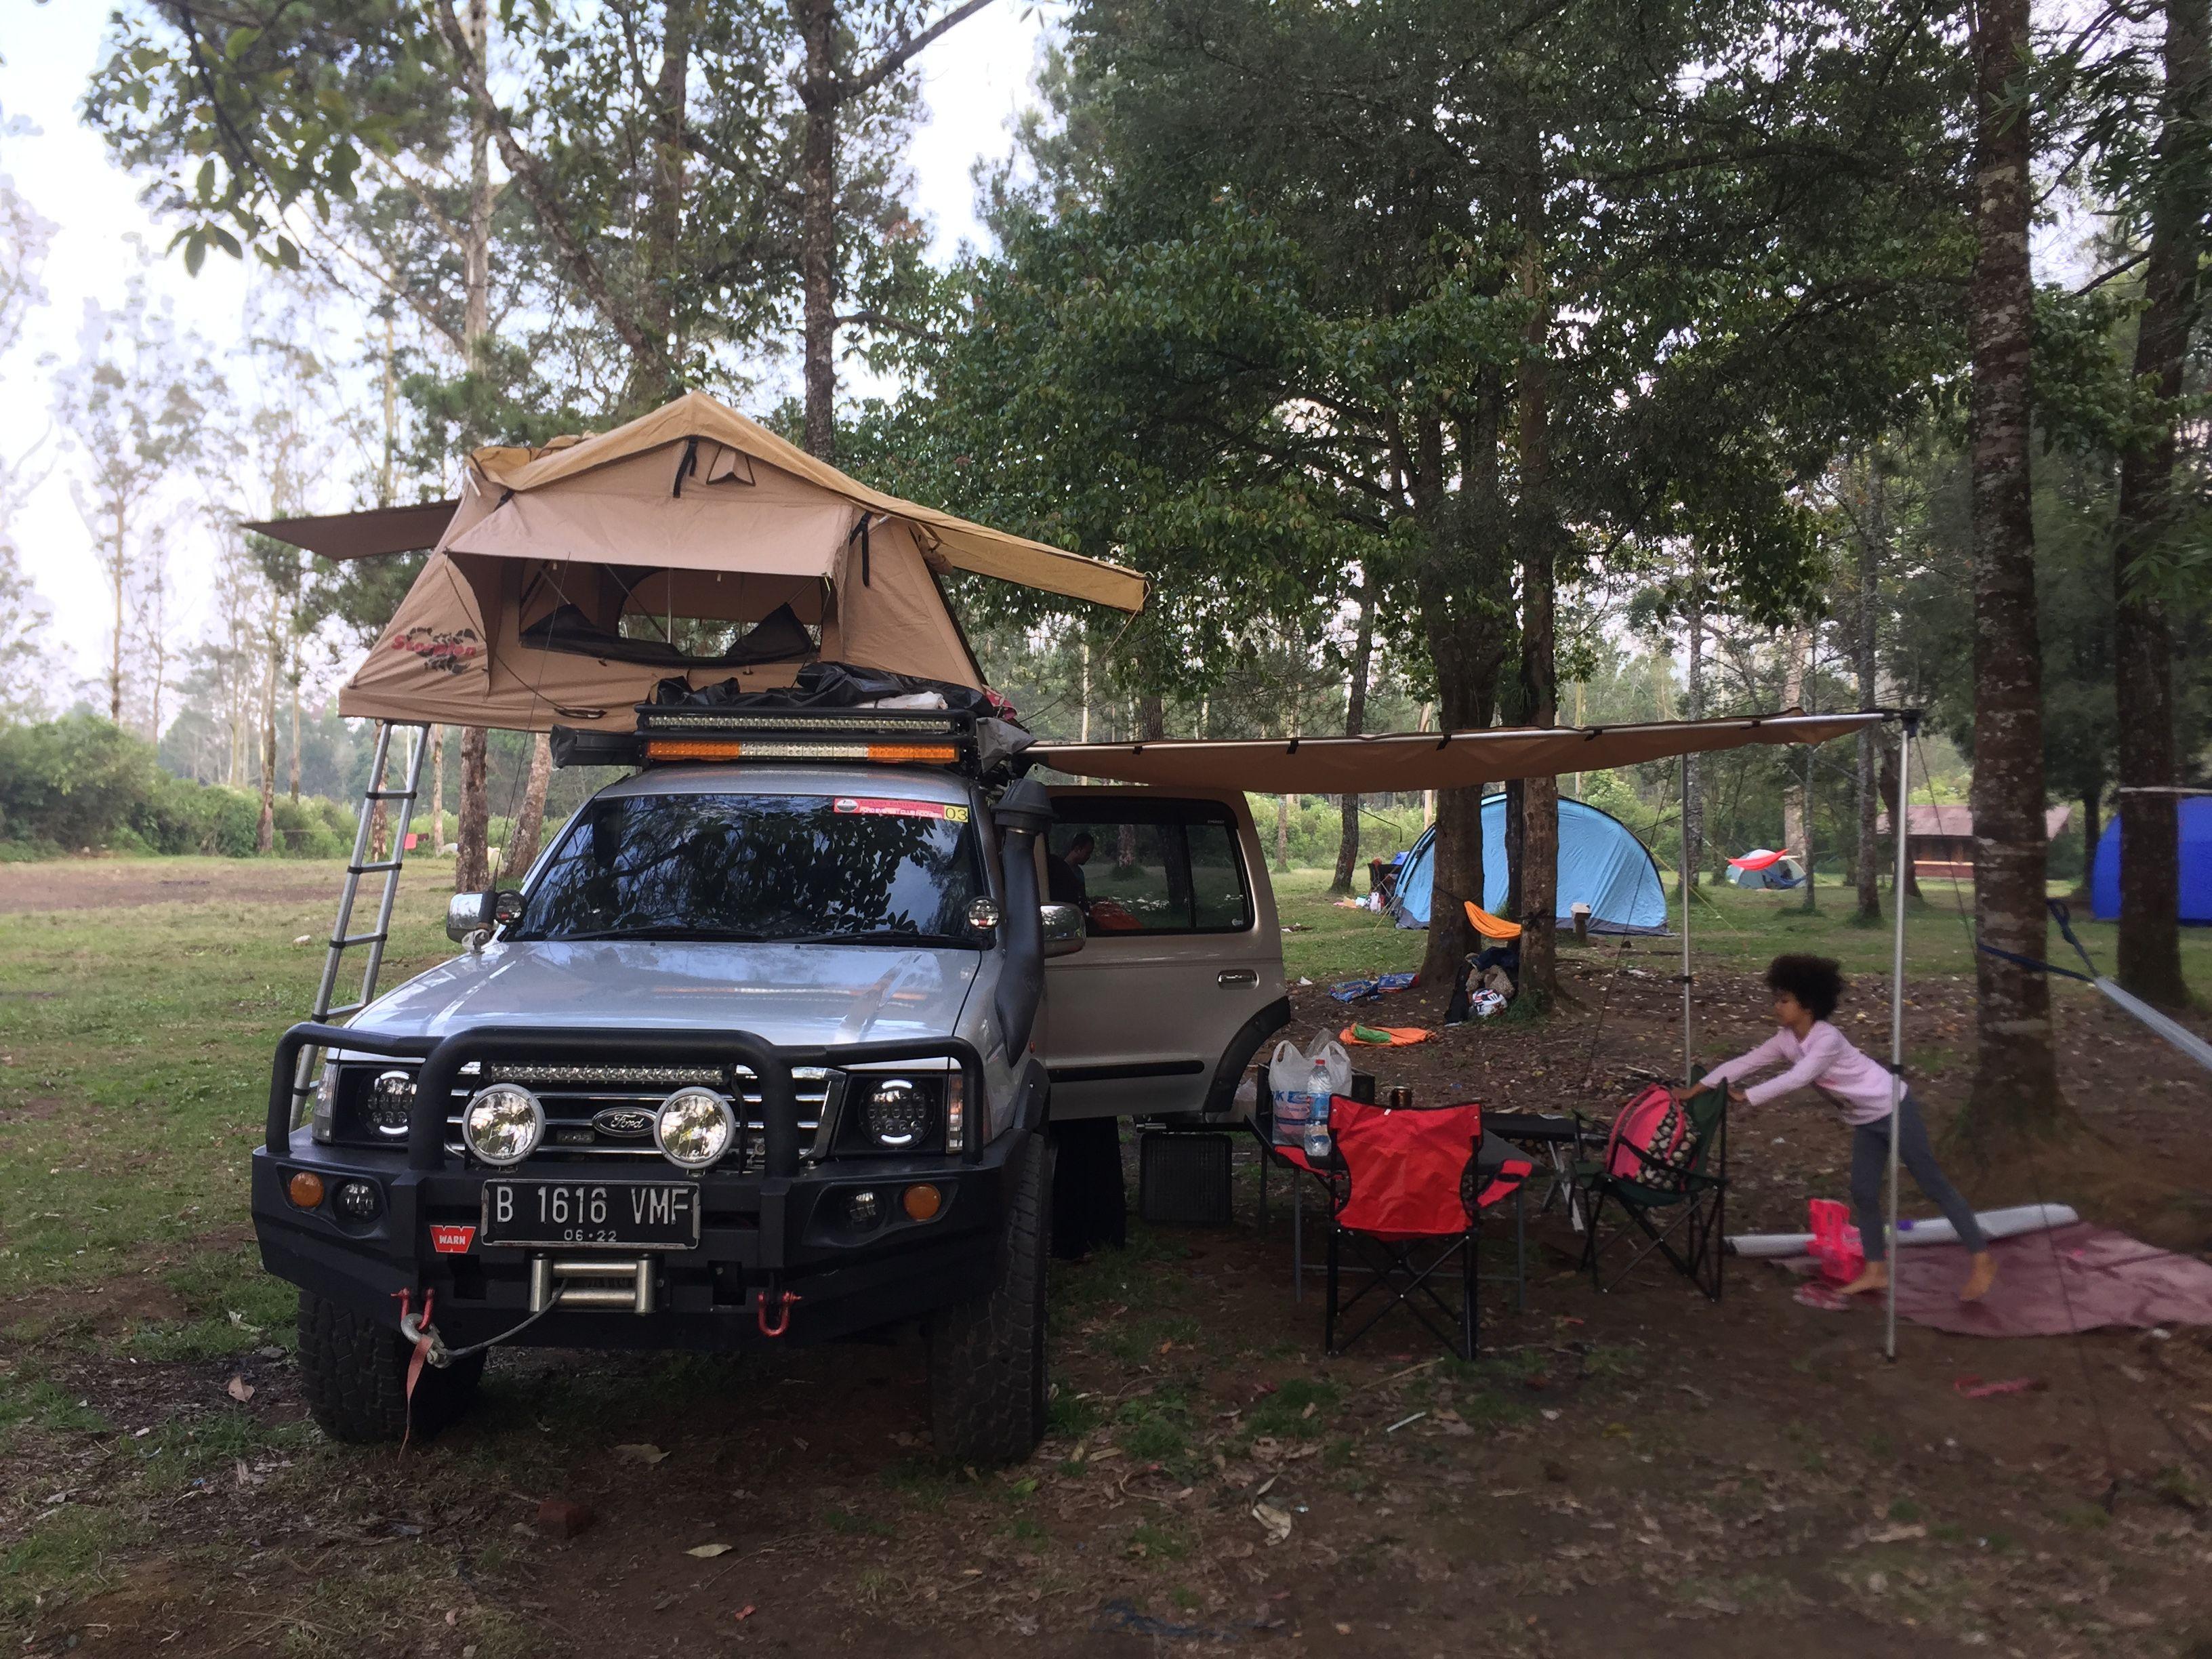 Ford Everest Tdi 4x4 Rooftent Dengan Gambar